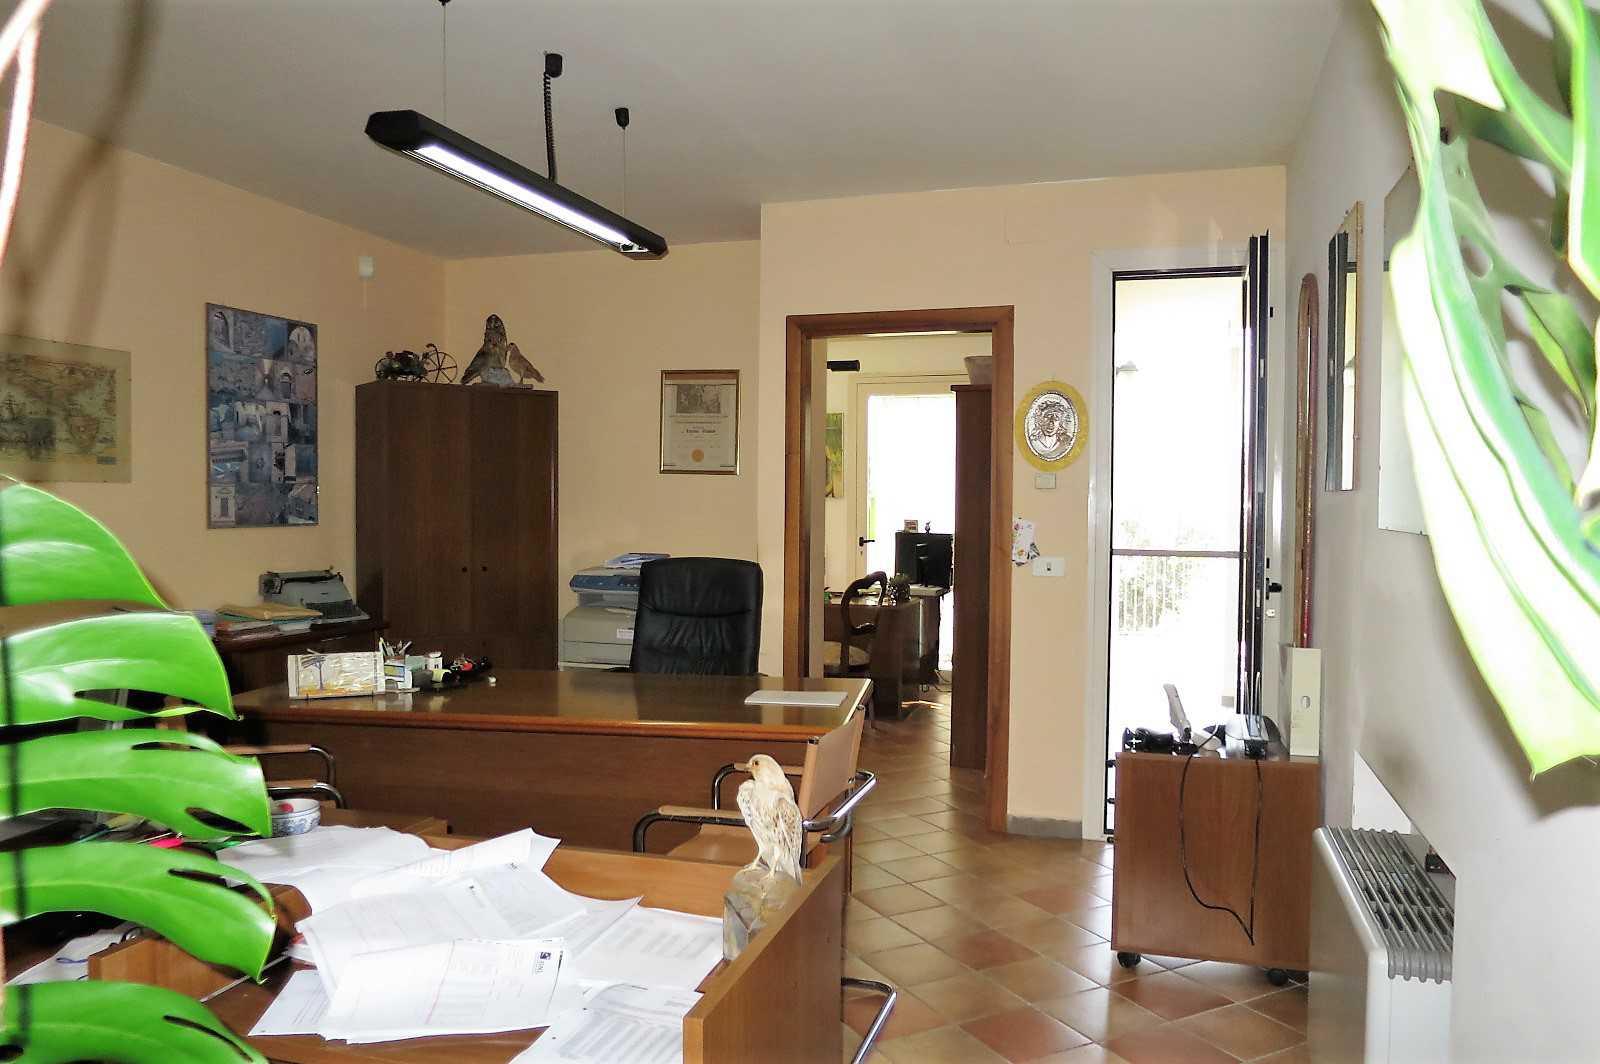 Villa Villa in vendita Atri (TE), Villa Paola - Atri - EUR 471.071 170